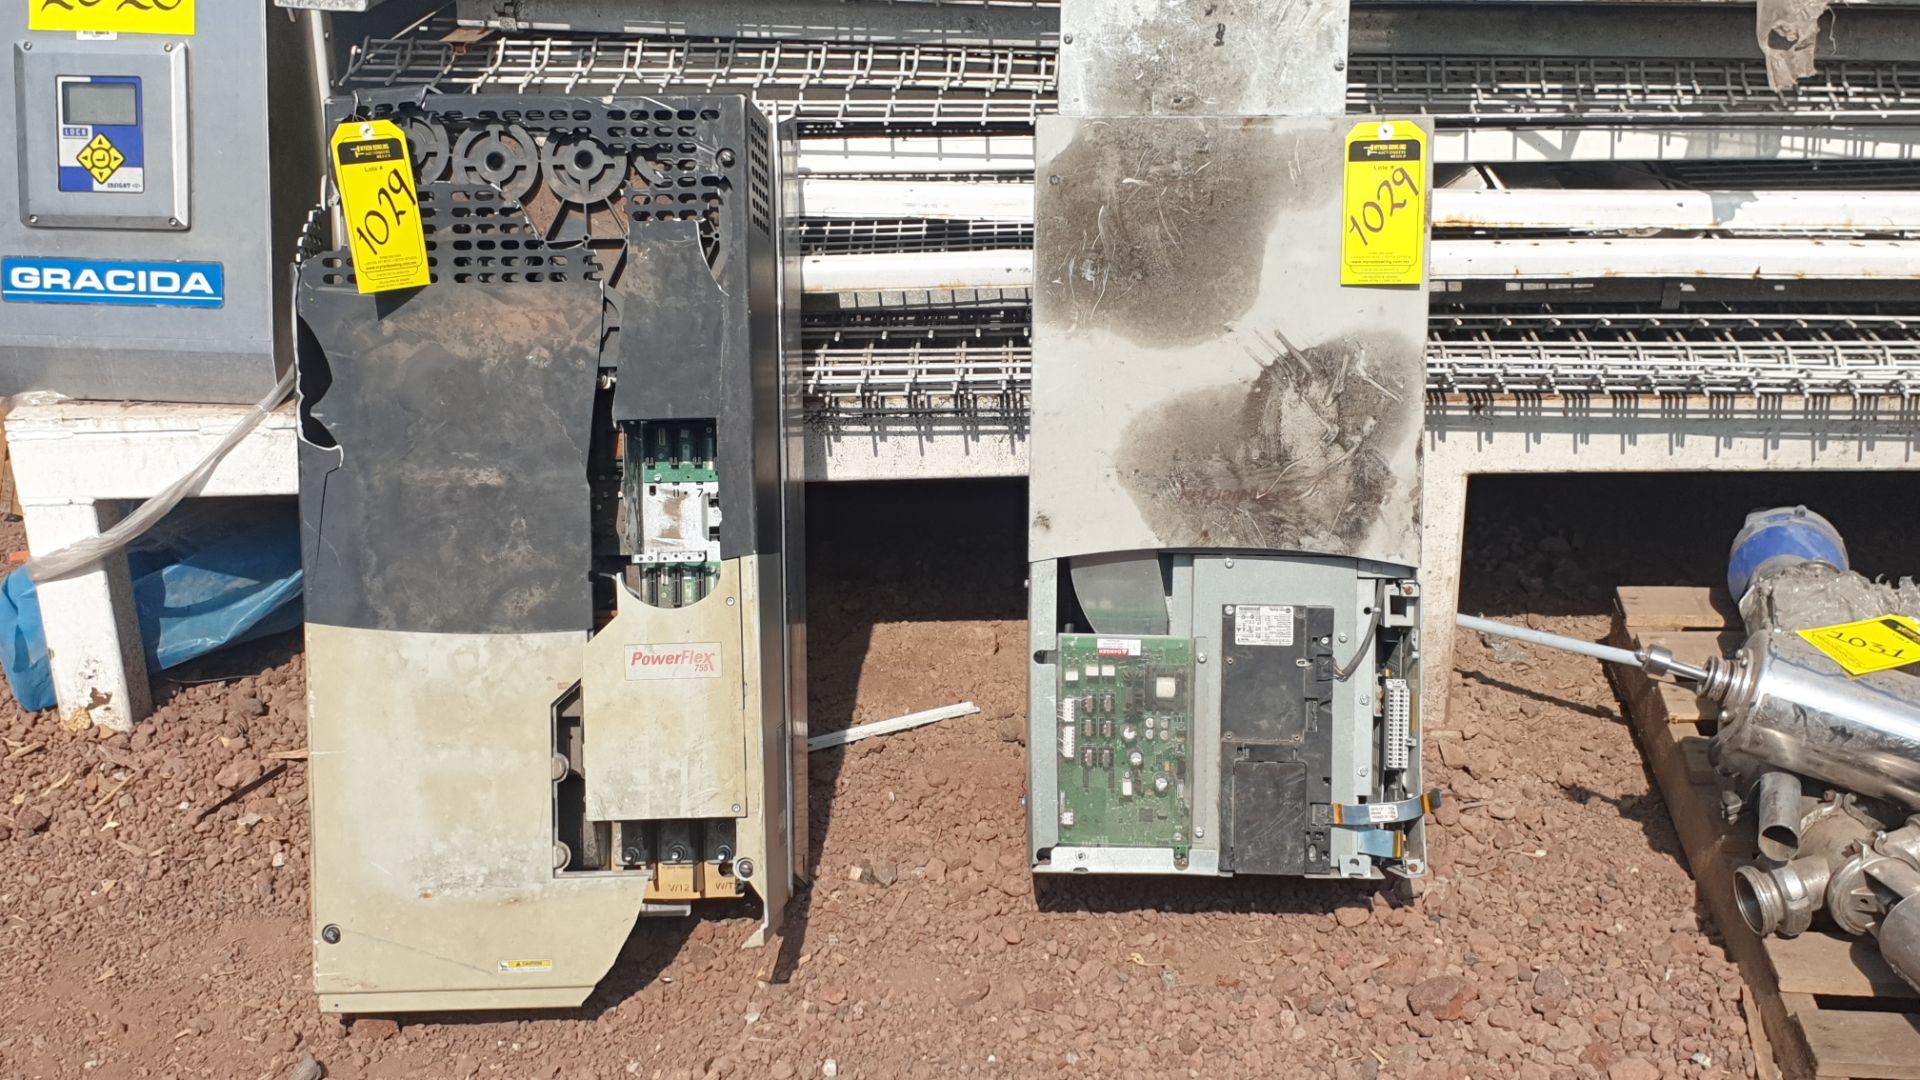 2 Powerflex Variator boards, model 20G1AN, 20BD180A0AYNANC0 - Image 9 of 13